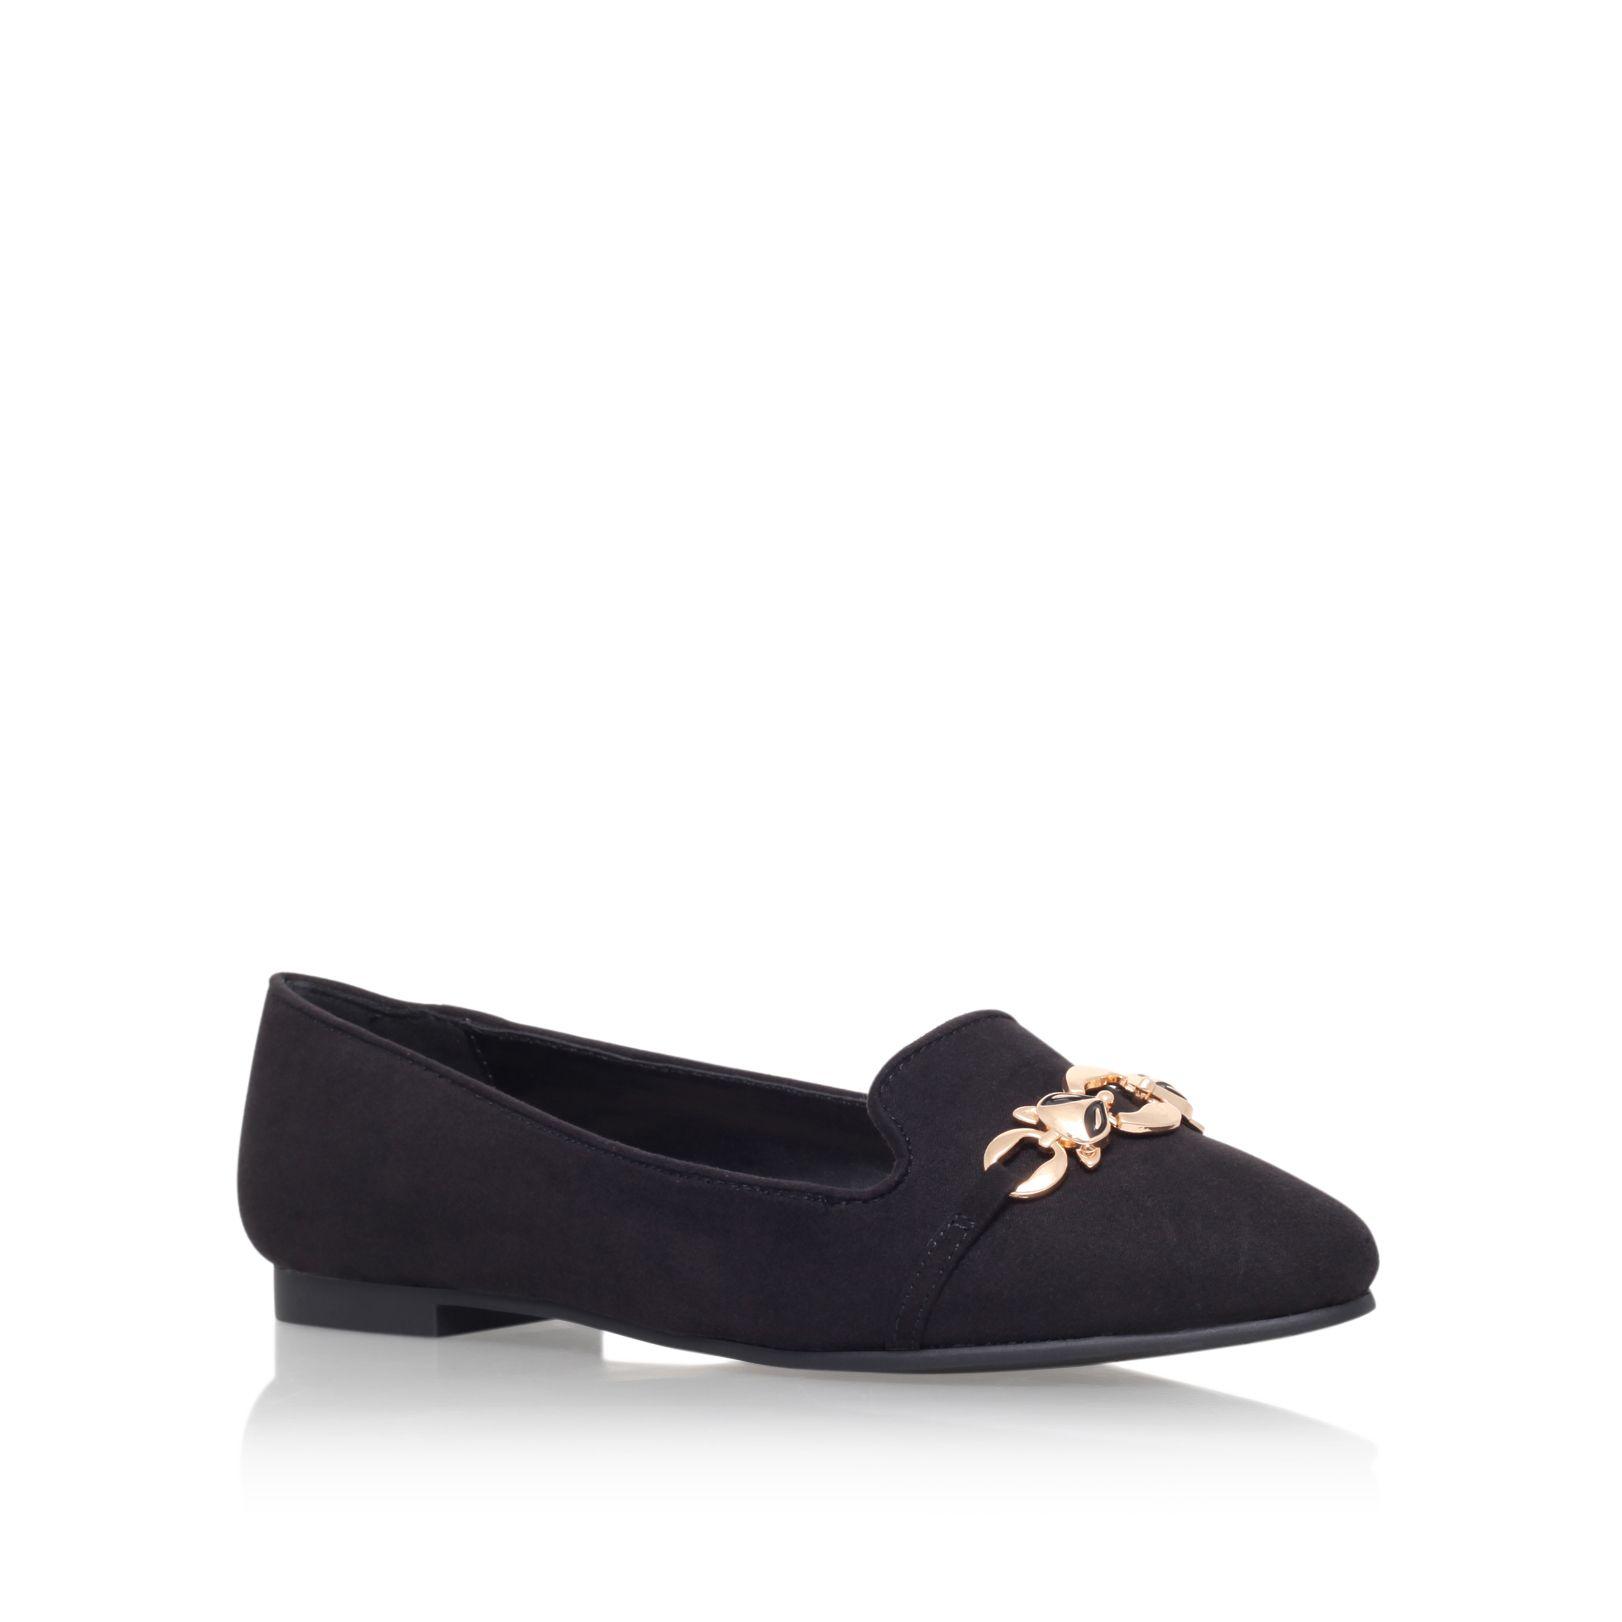 Carvela Kurt Geiger Milo Flat Slip On Shoes In Black Lyst